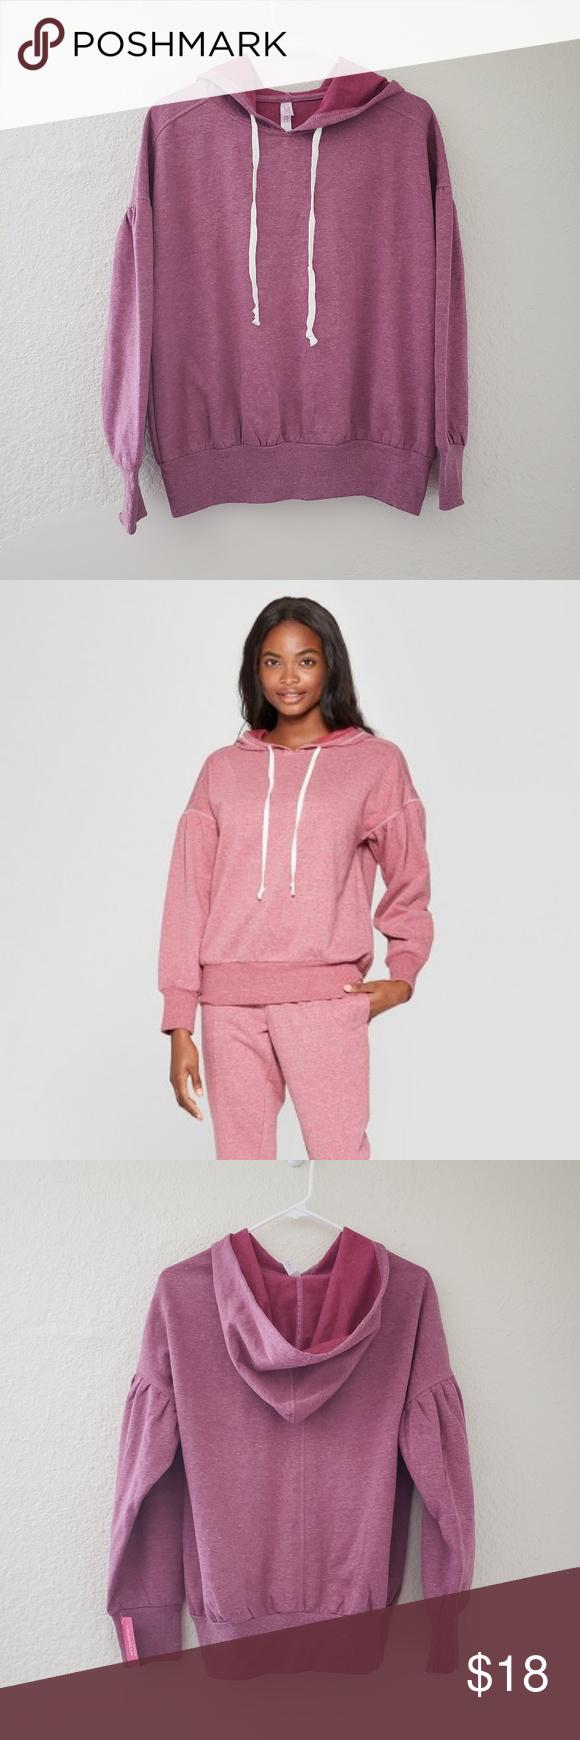 Xhilaration Womens Cozy Hooded Sleep Sweatshirt